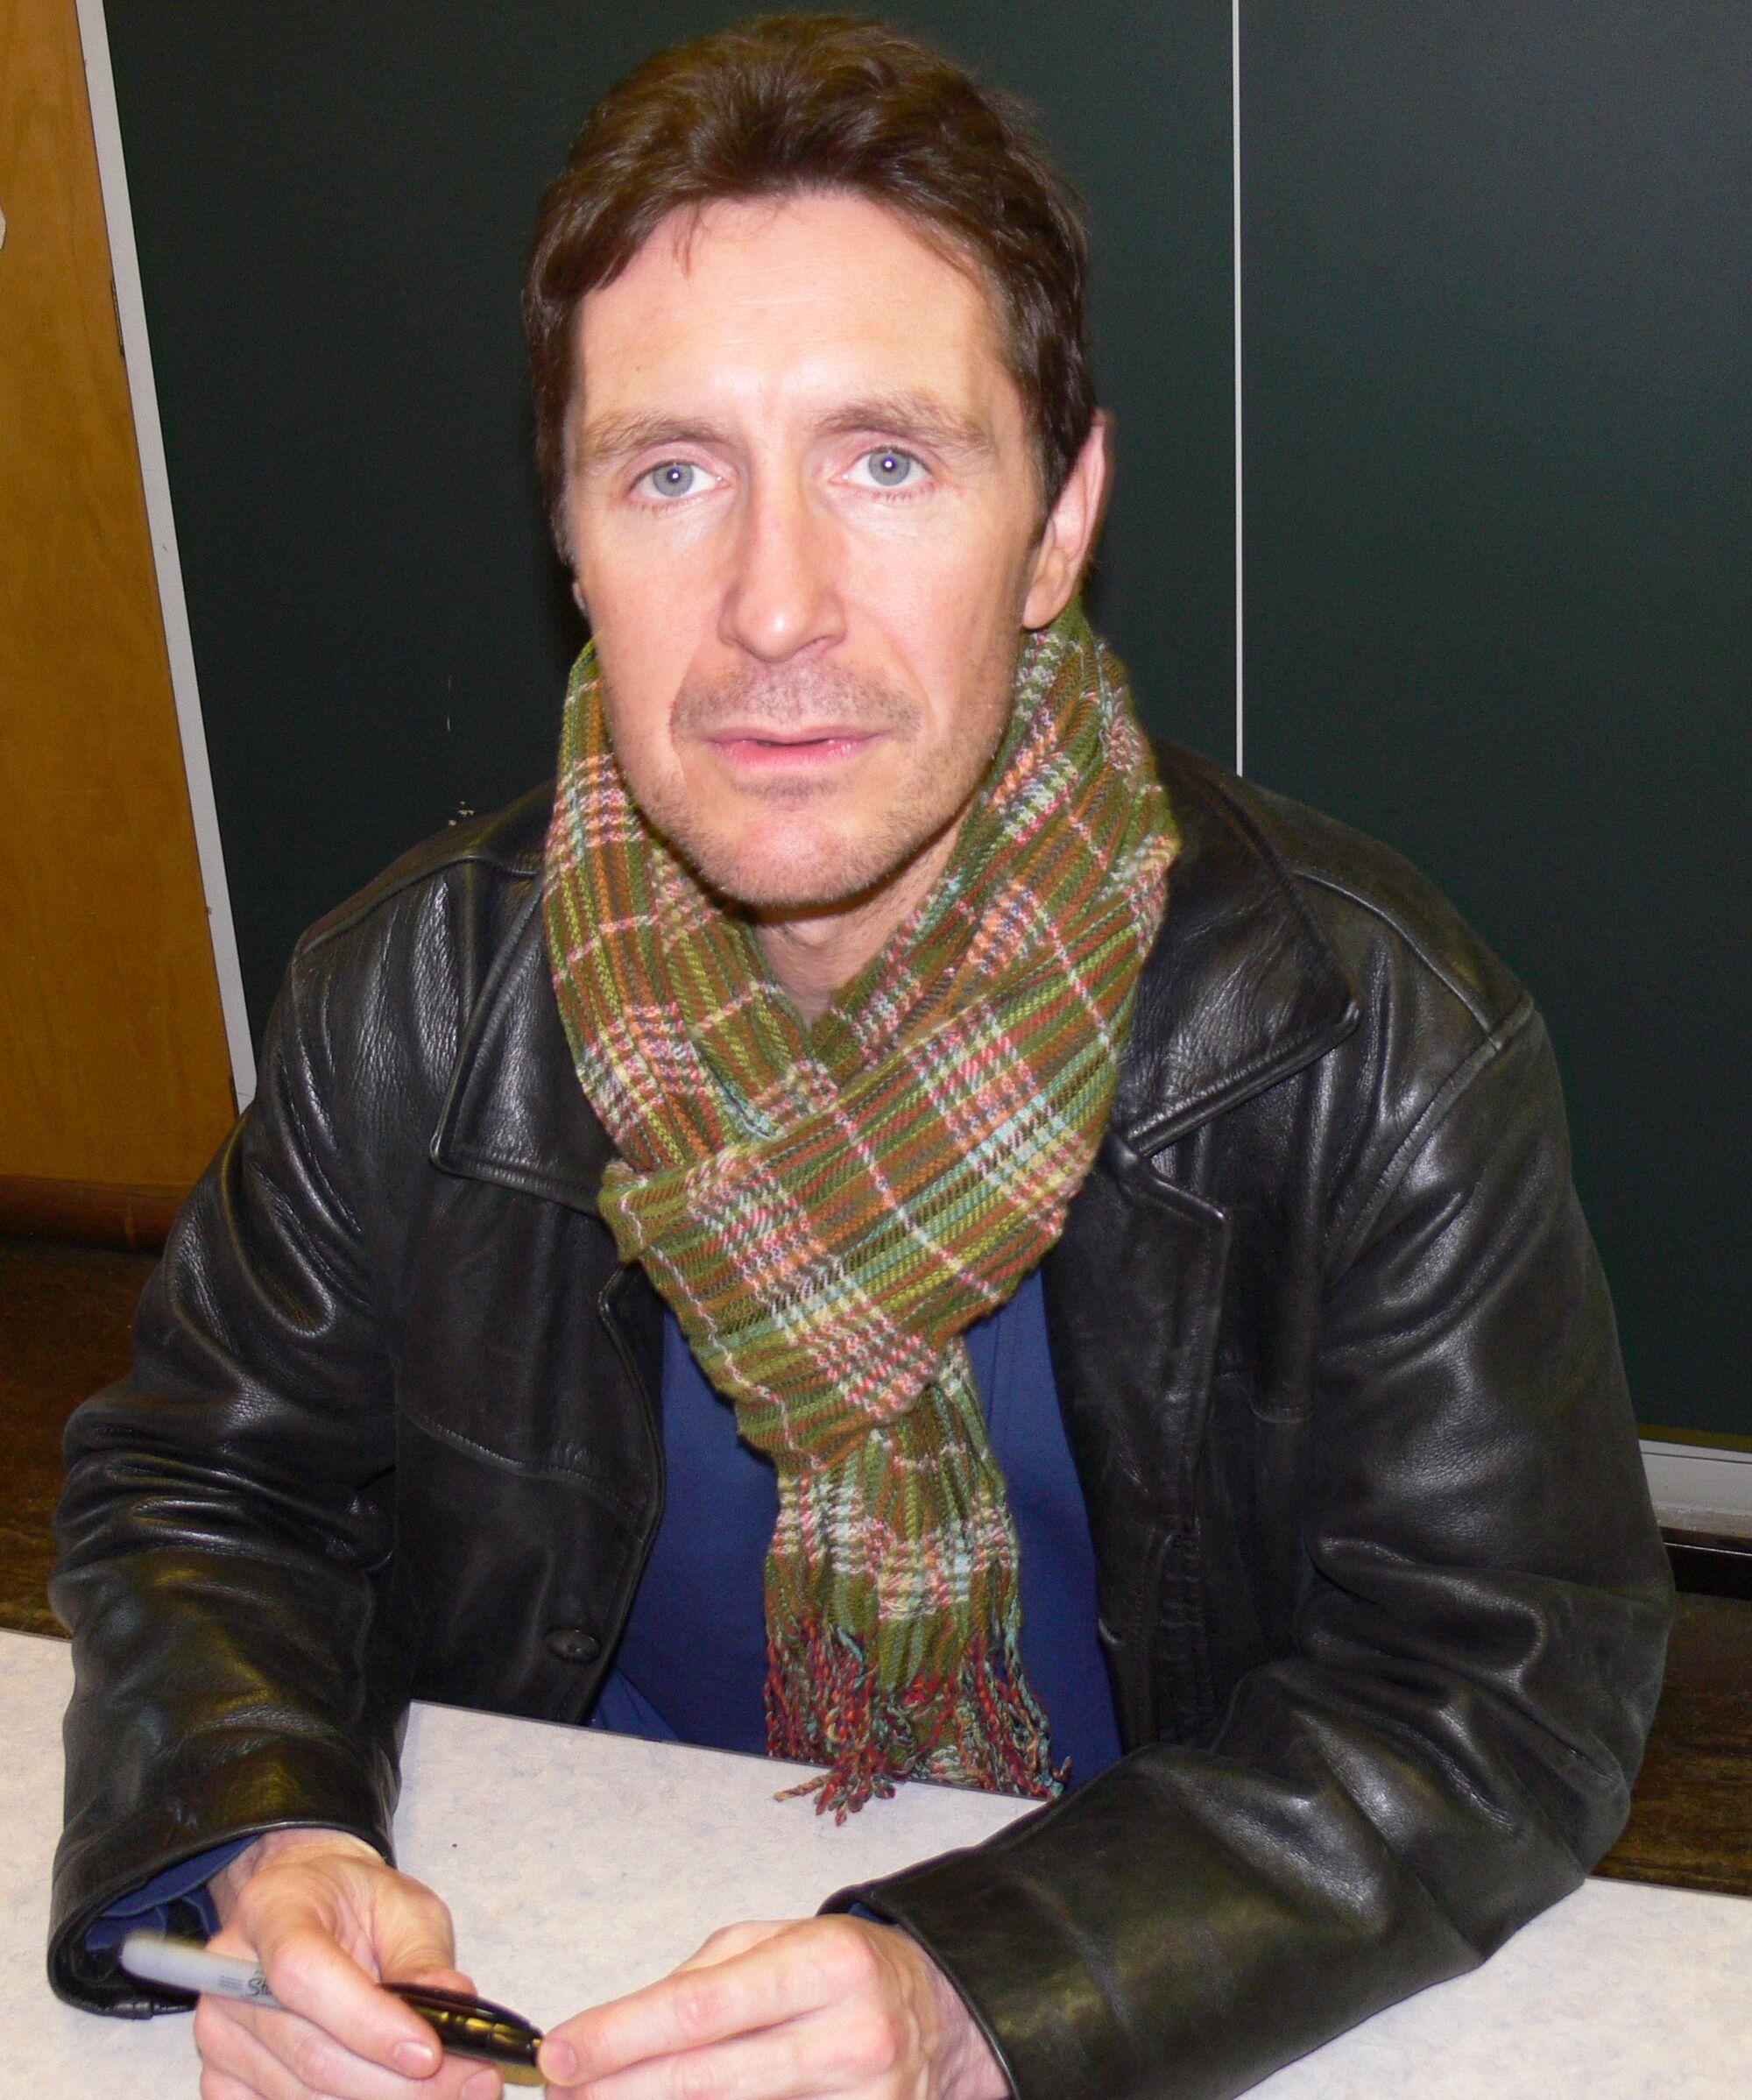 Joe McGann (born 1958)